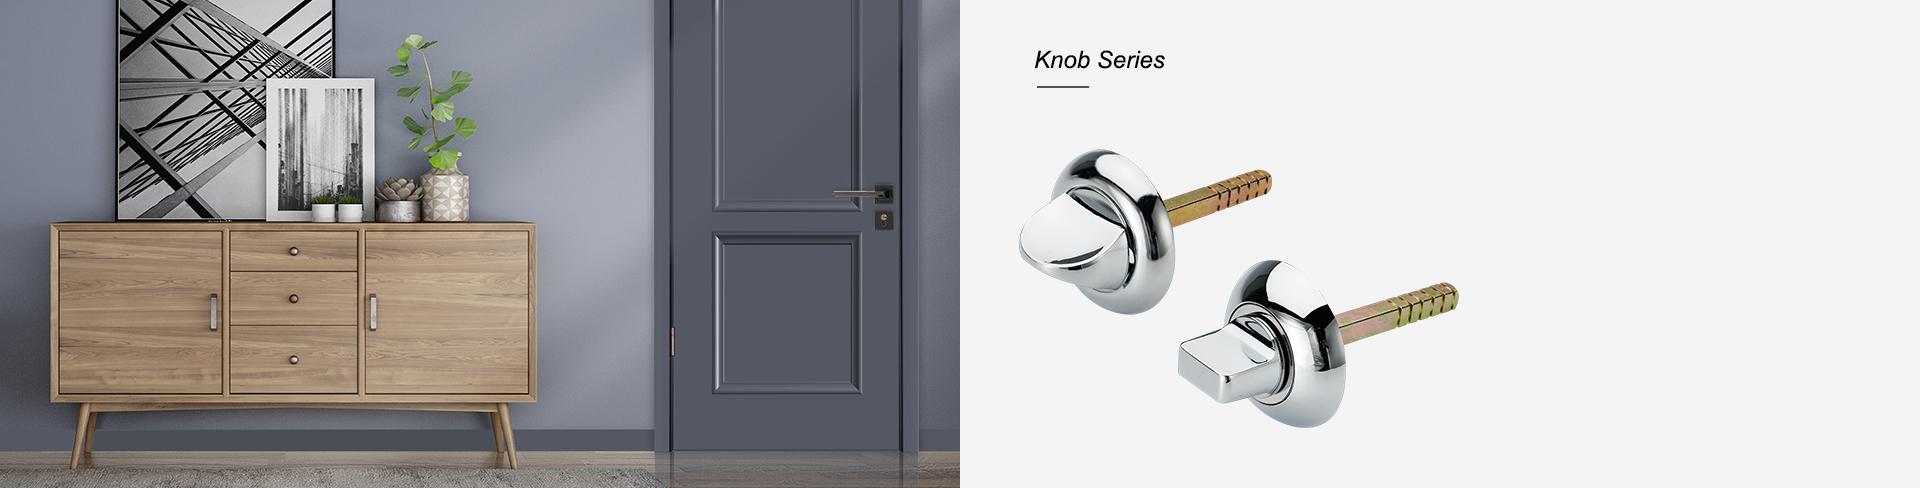 Knob Series